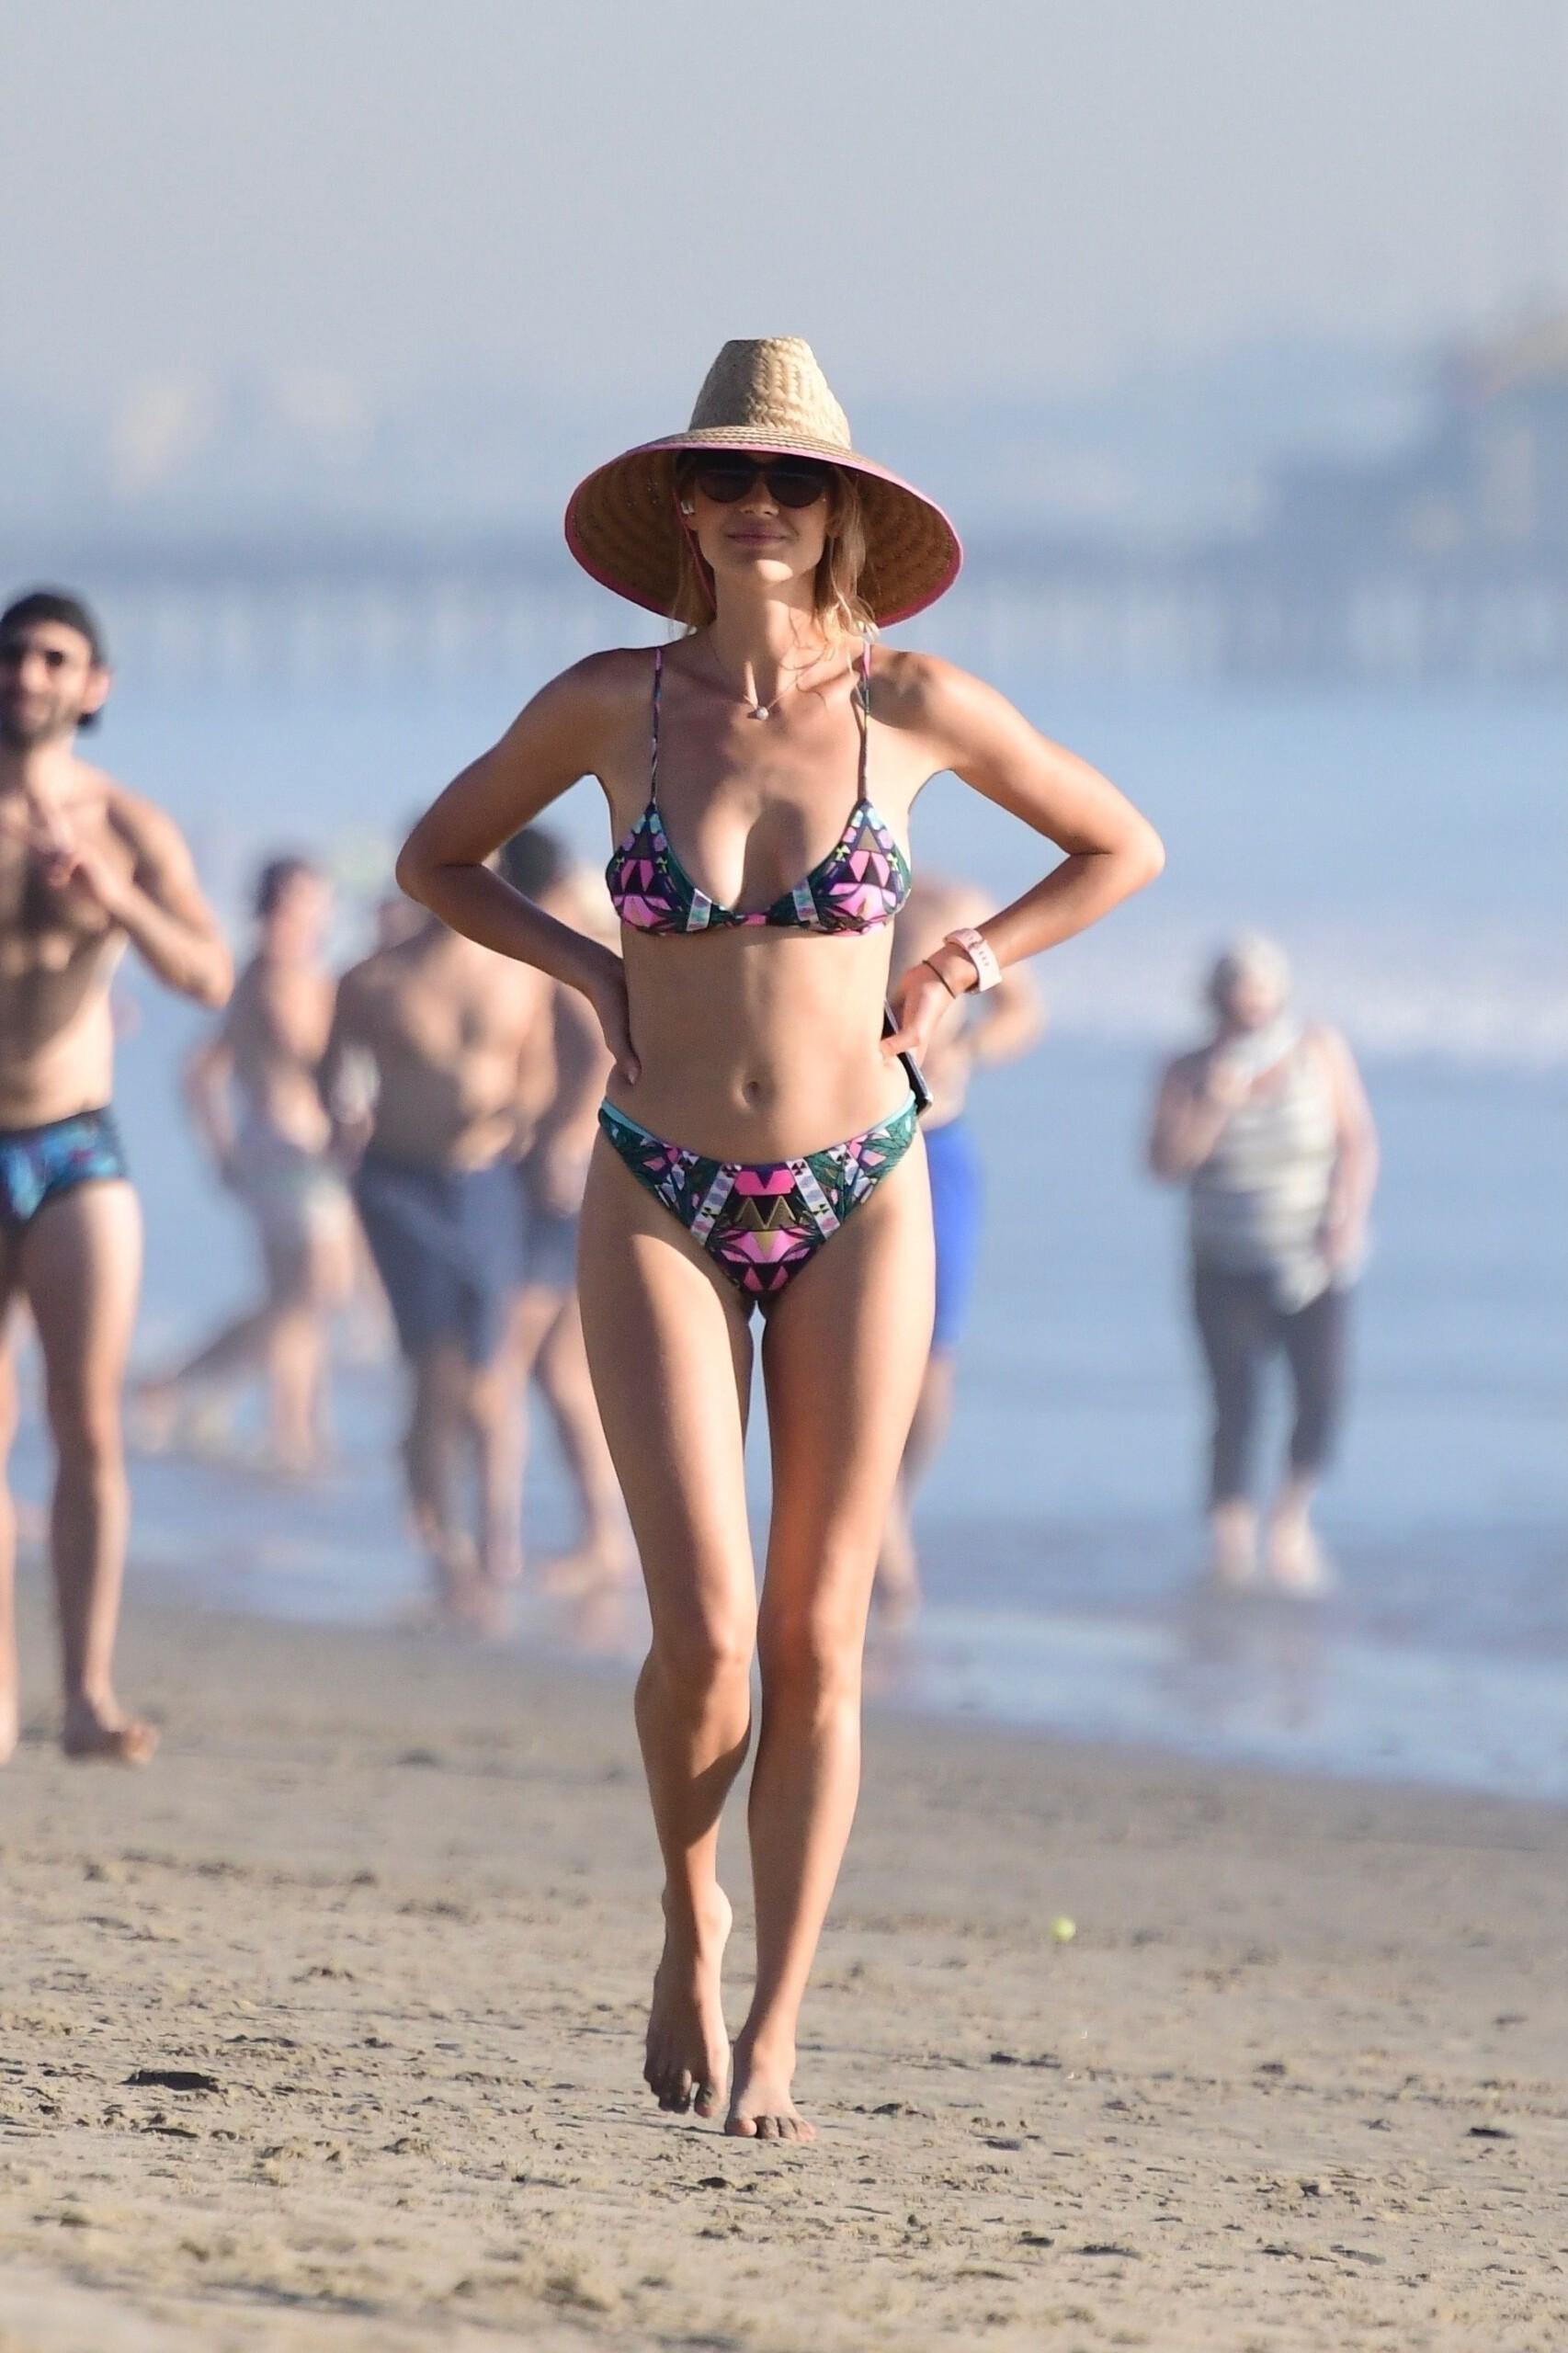 Kelly Rohrbach In Small Bikini